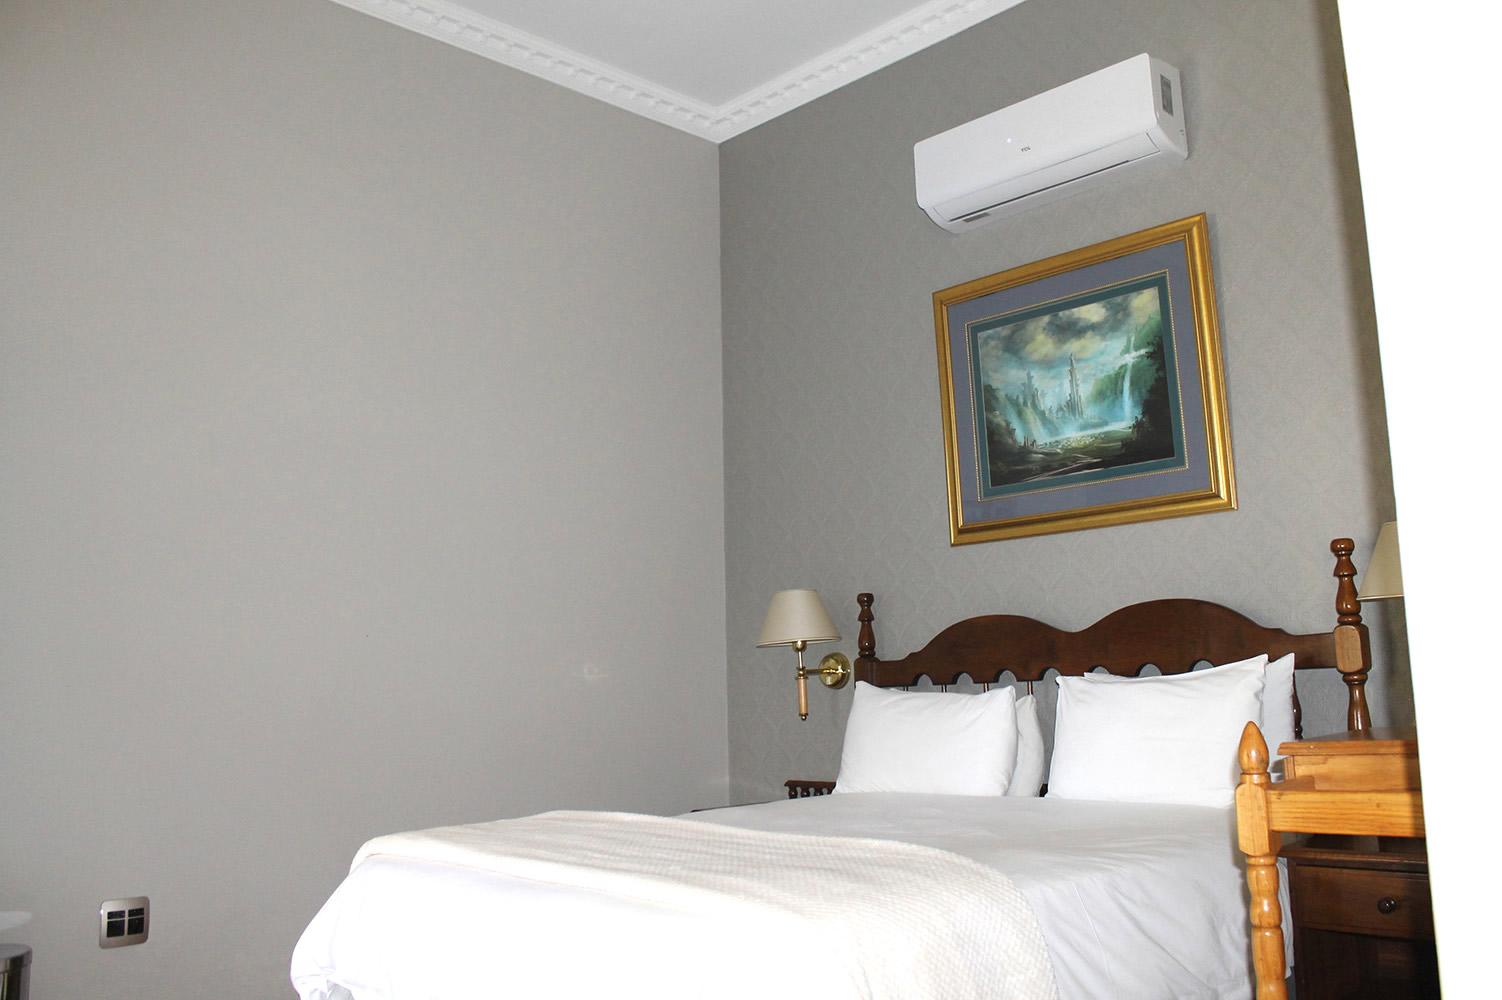 Kili: Rooms at Hobbit Hotel